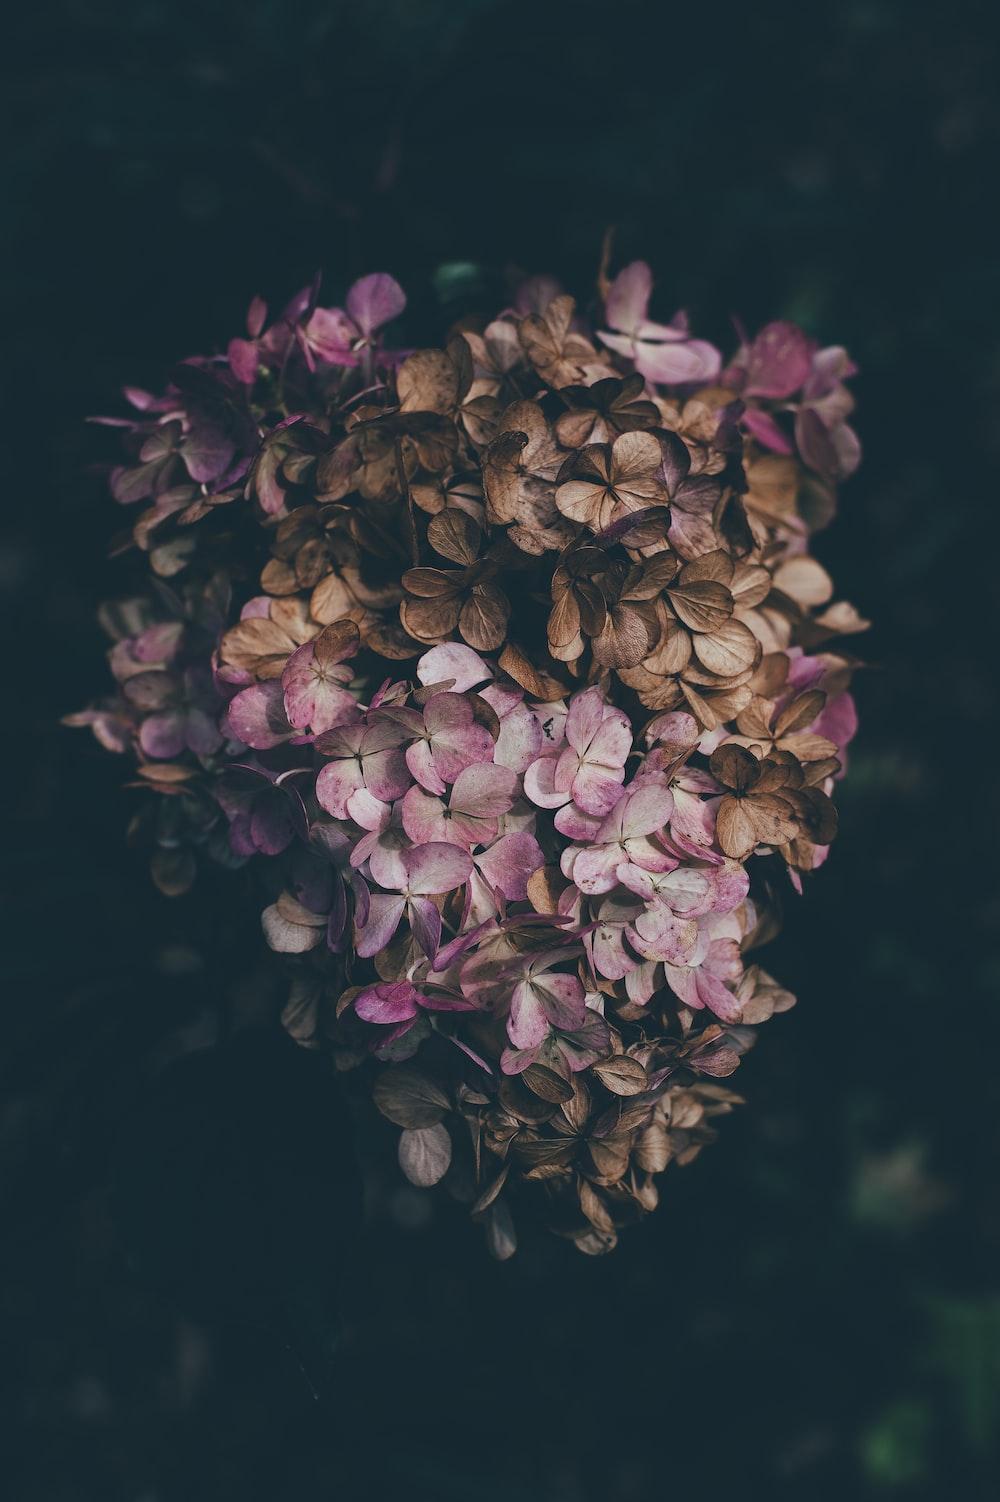 purple petaled flowers closeup photography